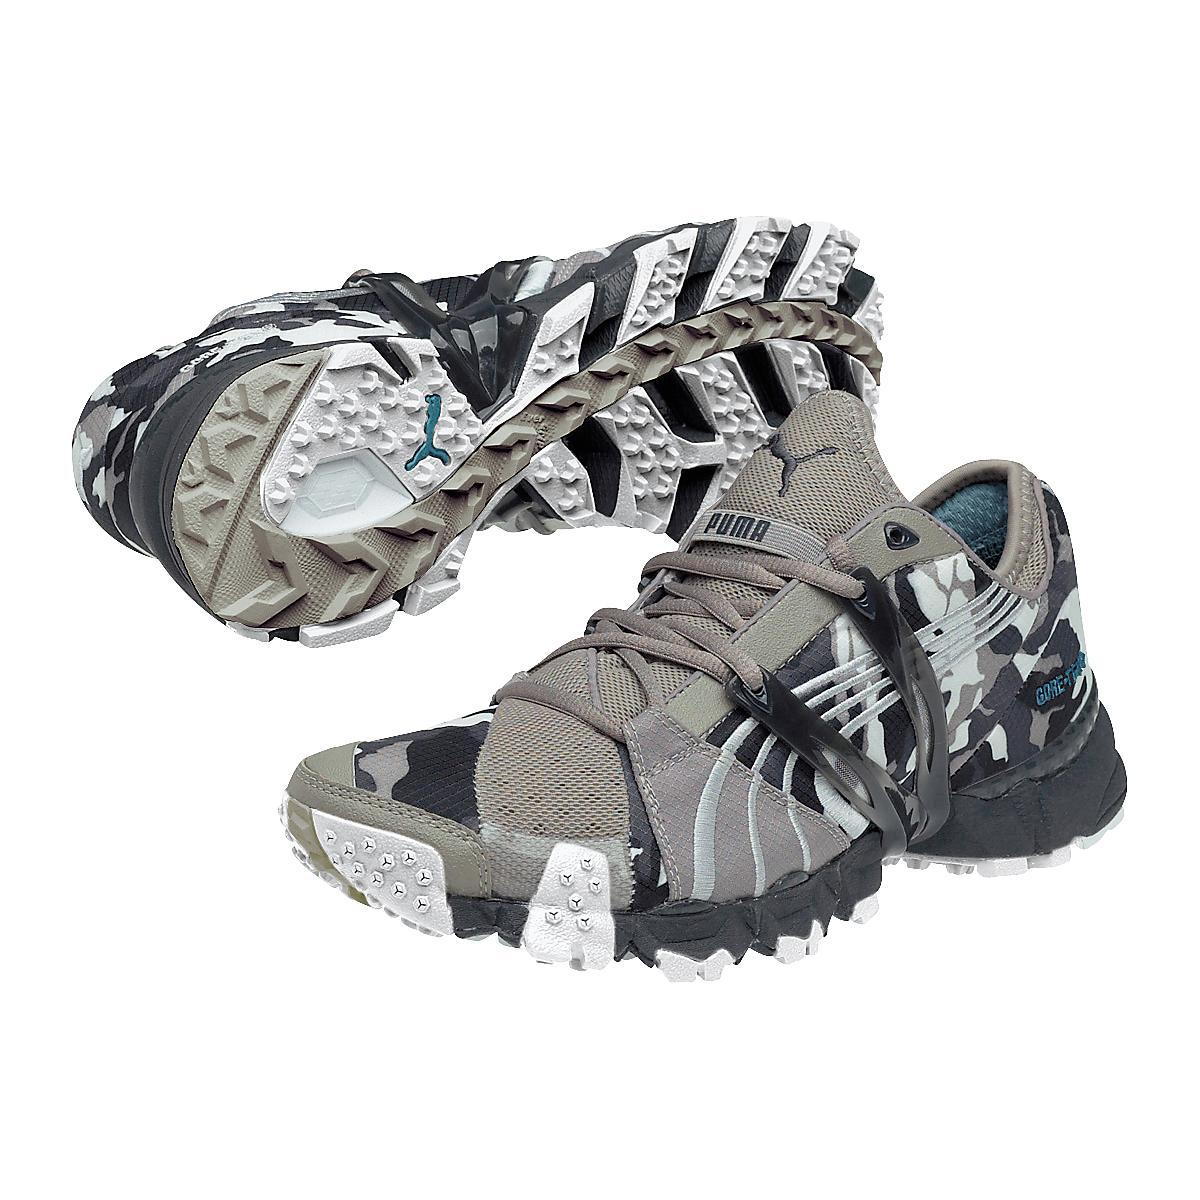 e8cb570b9 Mens PUMA Complete Trailfox III XCR Trail Running Shoe at Road Runner Sports